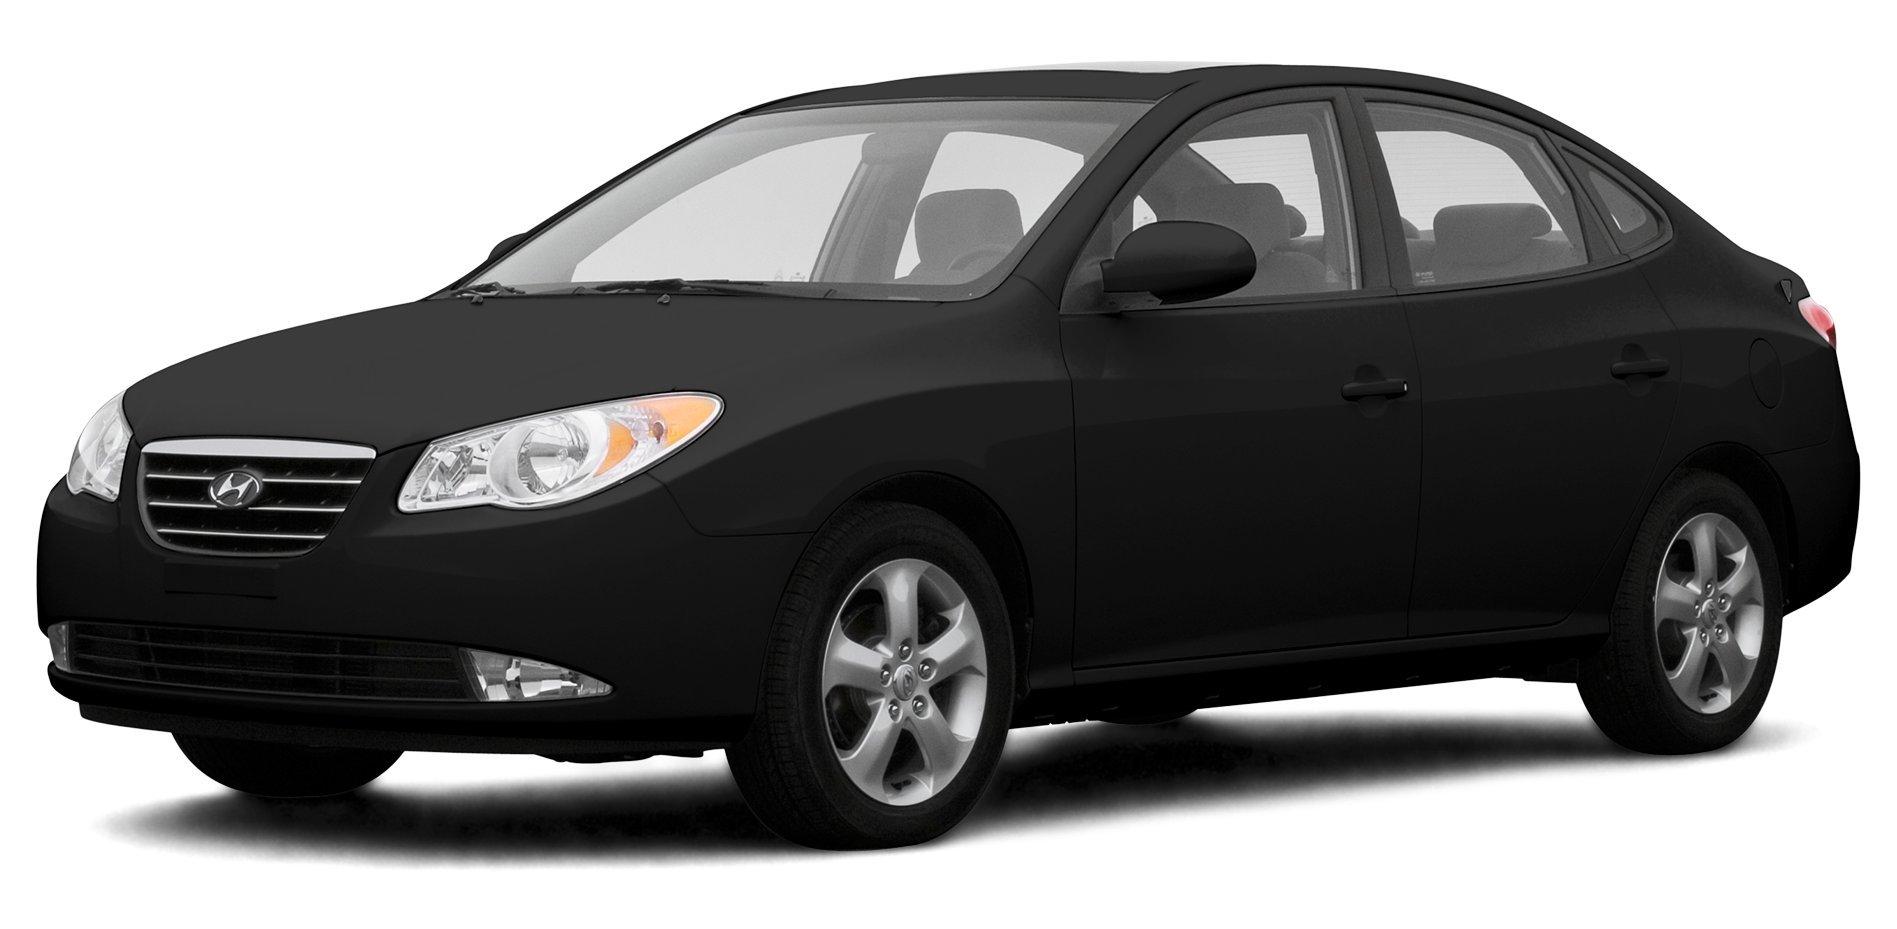 2007 pontiac vibe 2005 Hyundai Elantra Interior 2007 hyundai elantra limited, 4 door sedan manual transmission *limited availability*